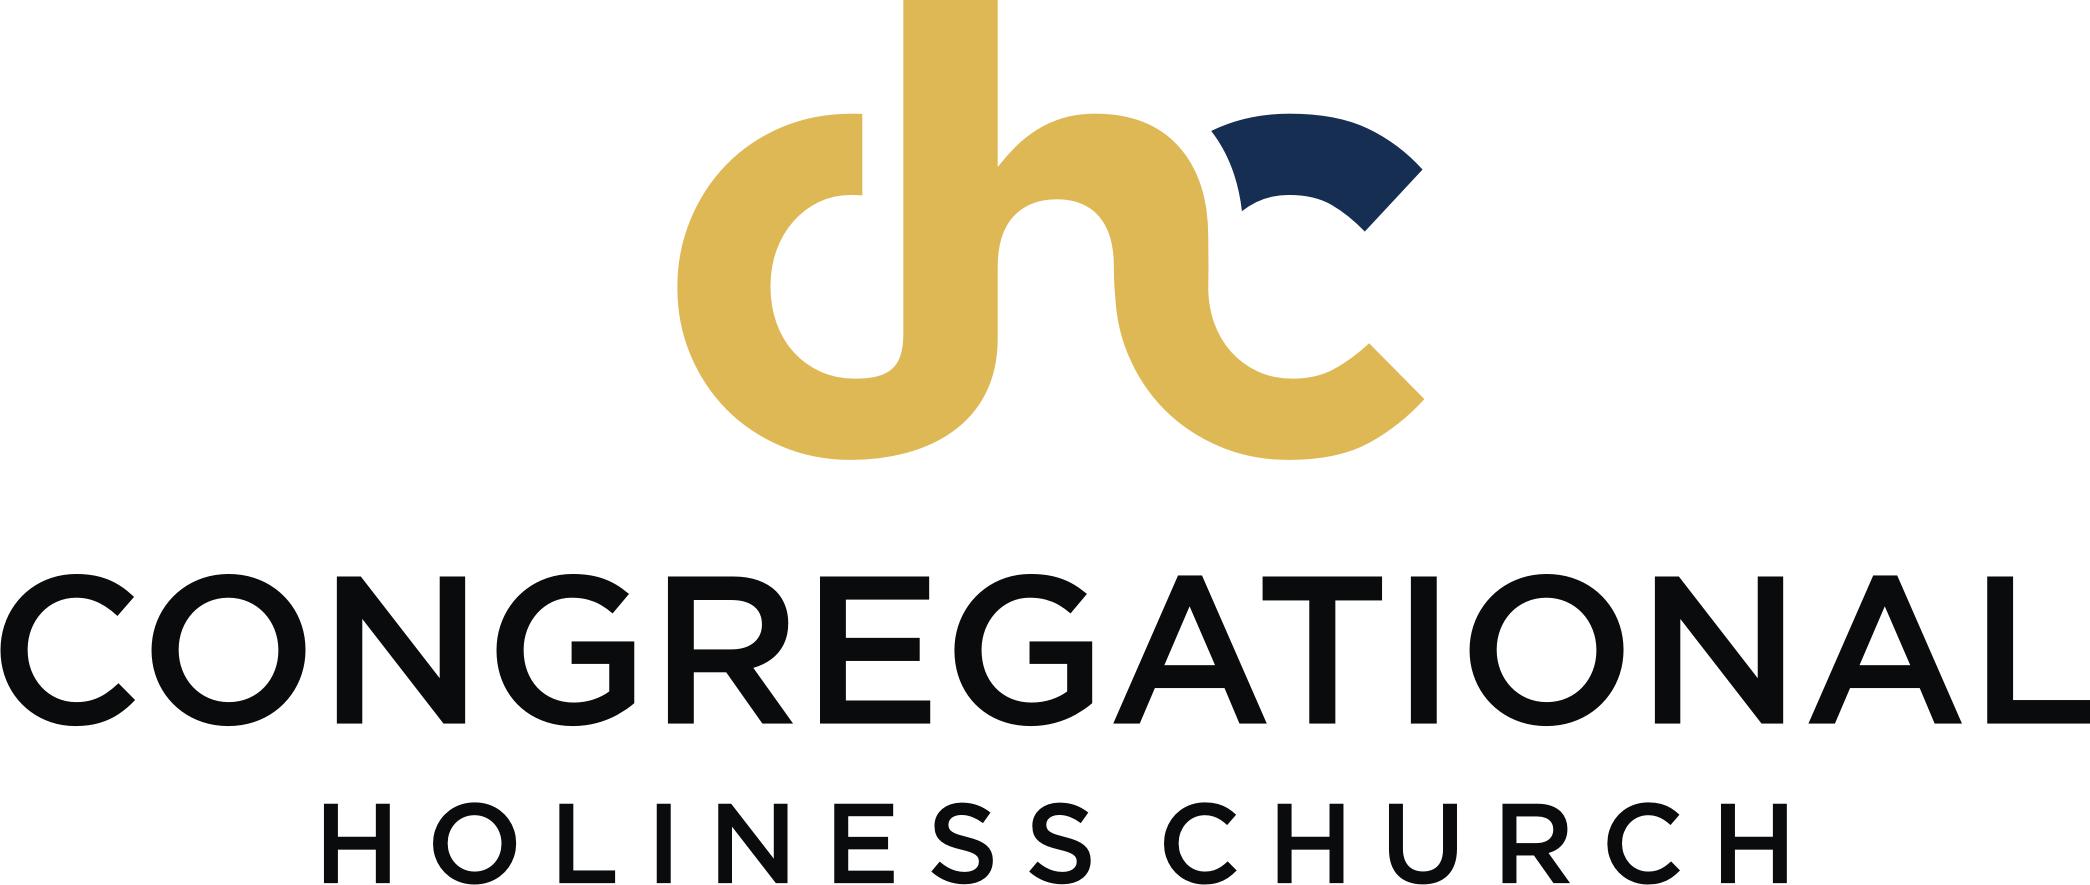 logo Congregational Holiness Church gold blue